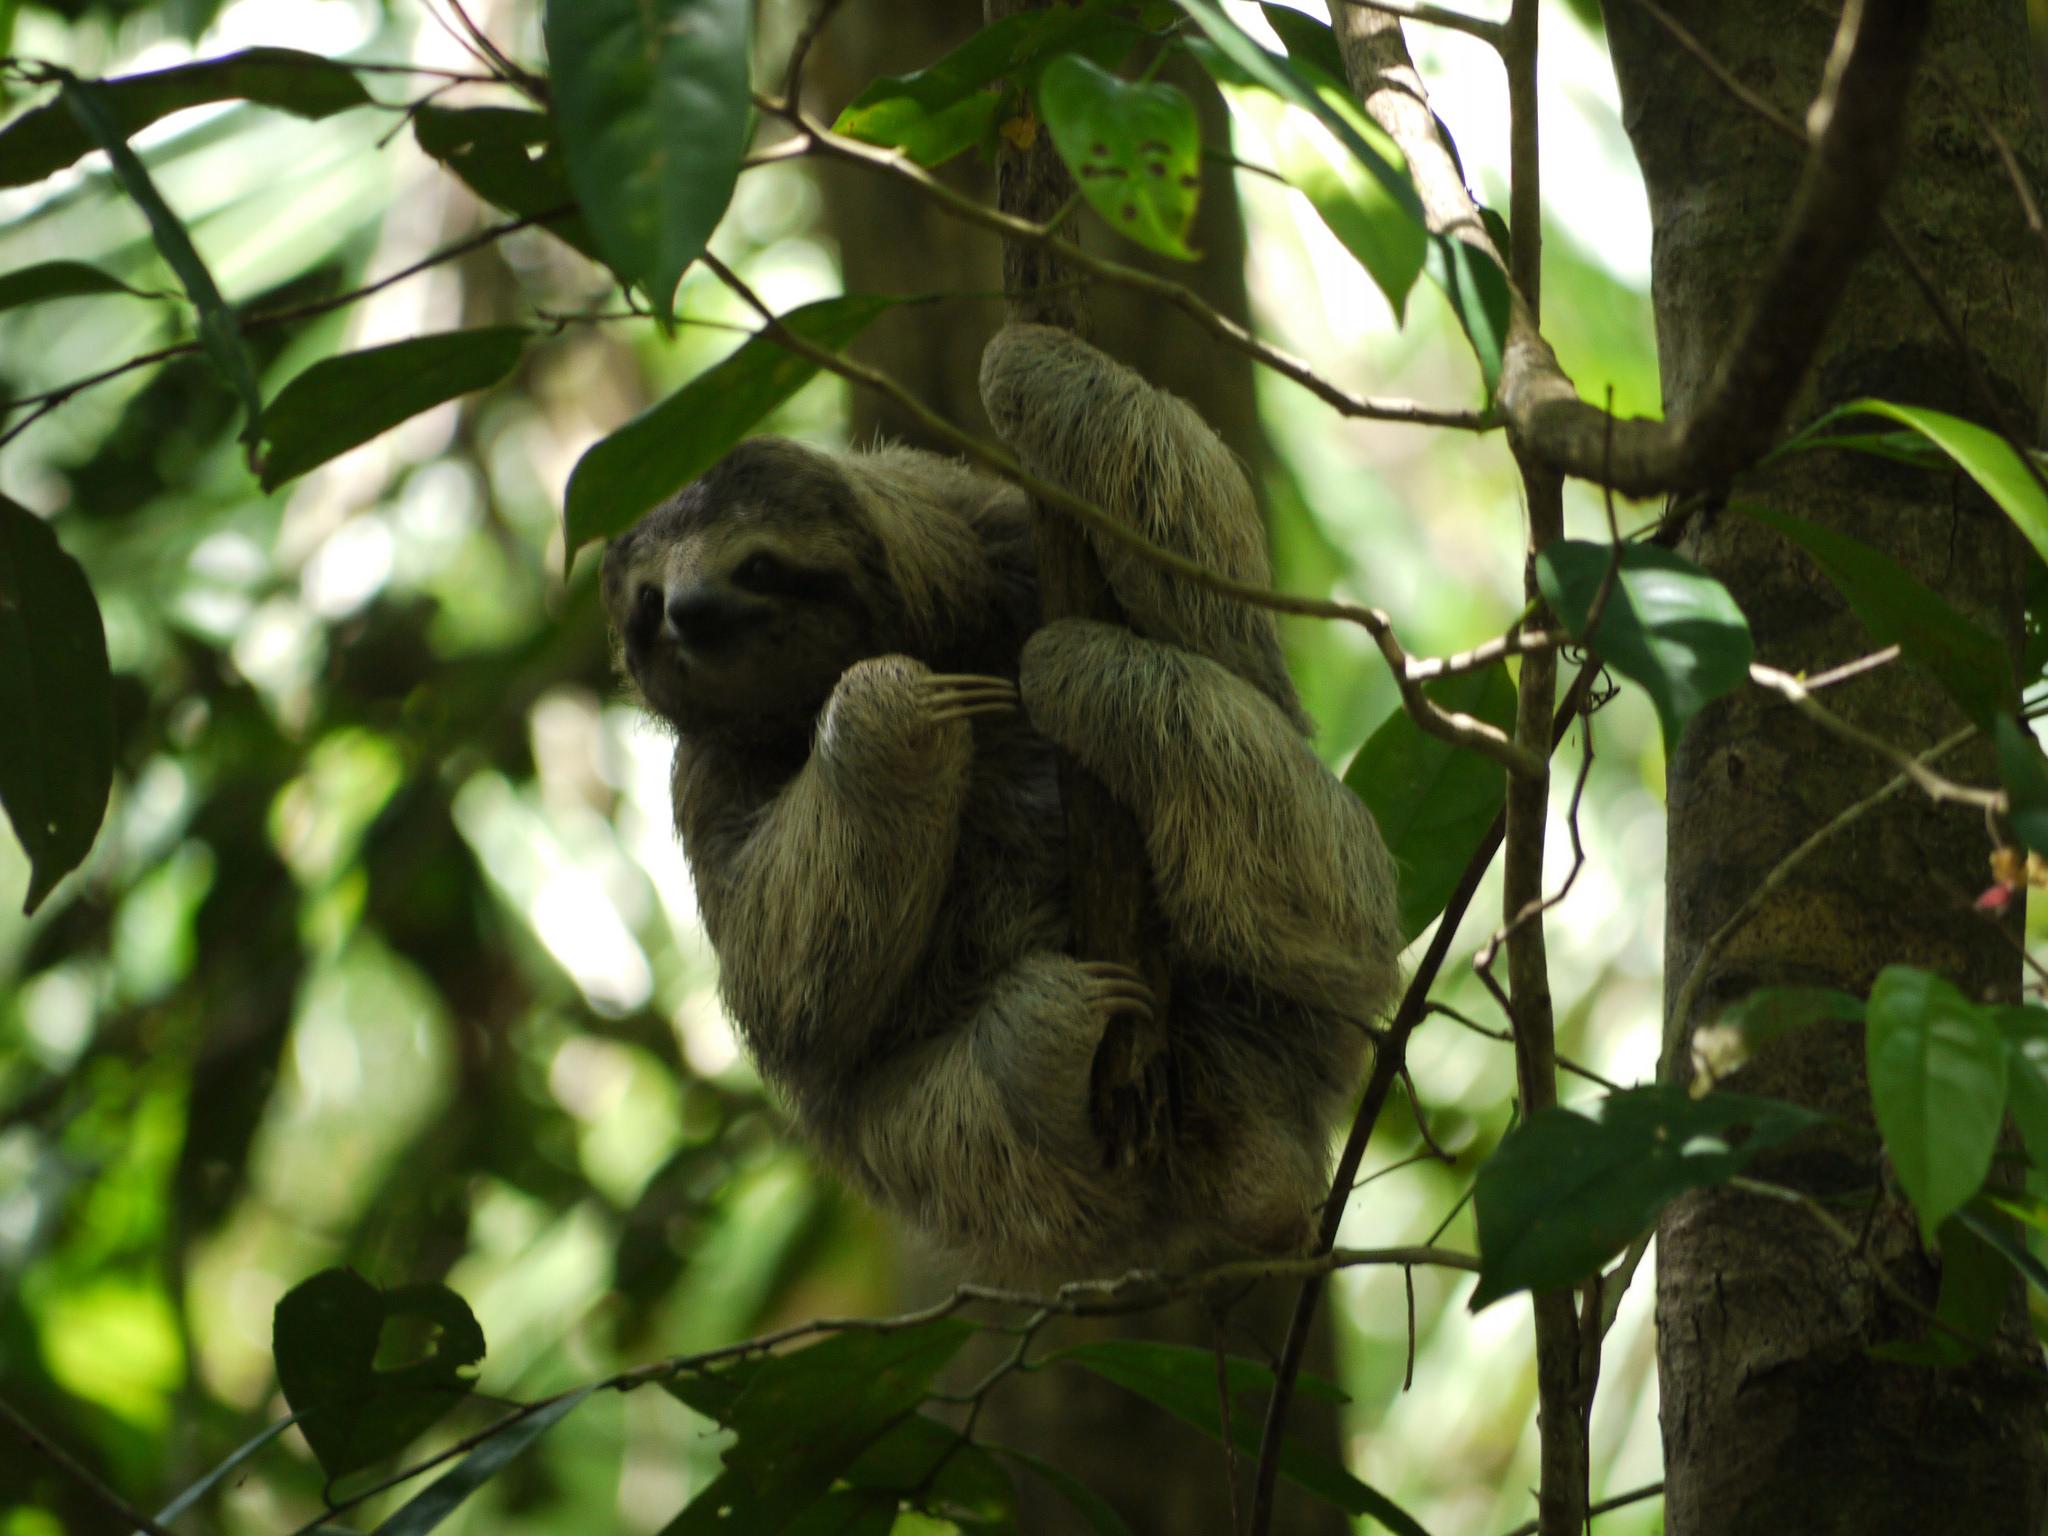 Sloth in rainforest